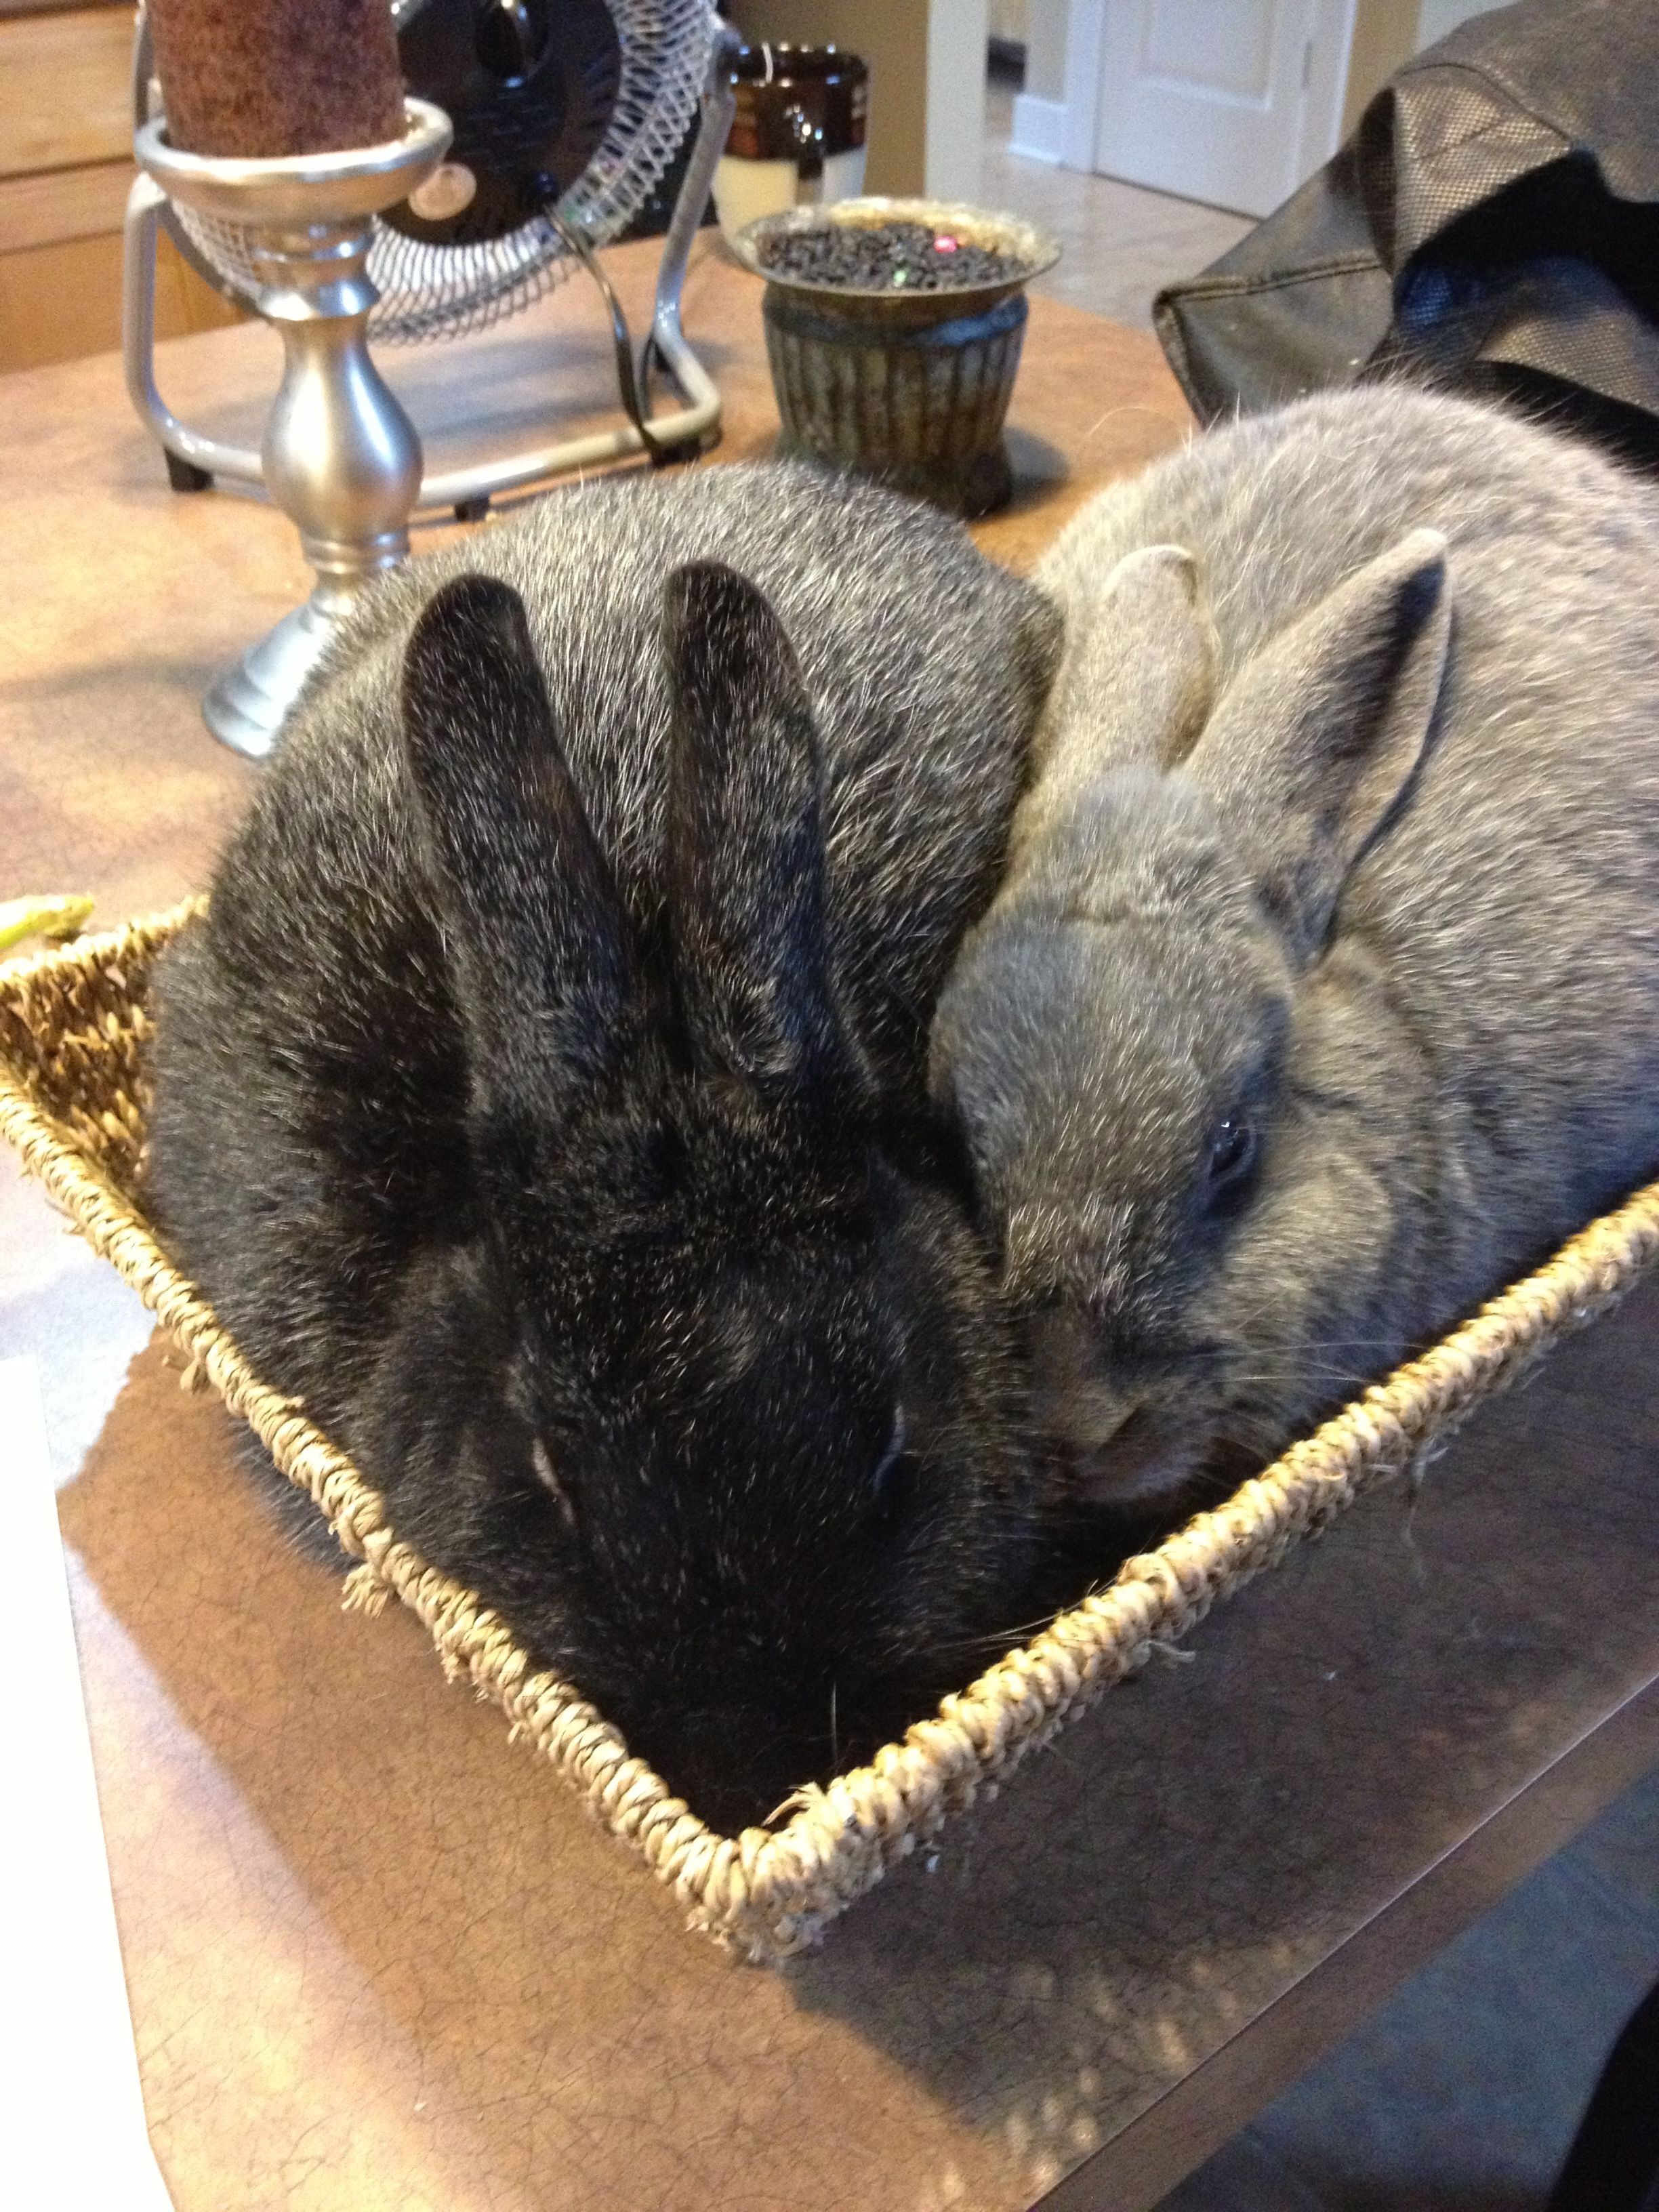 Origins Hobby Farm Silver Fox Rabbit Rabbit Breeds Raising Rabbits